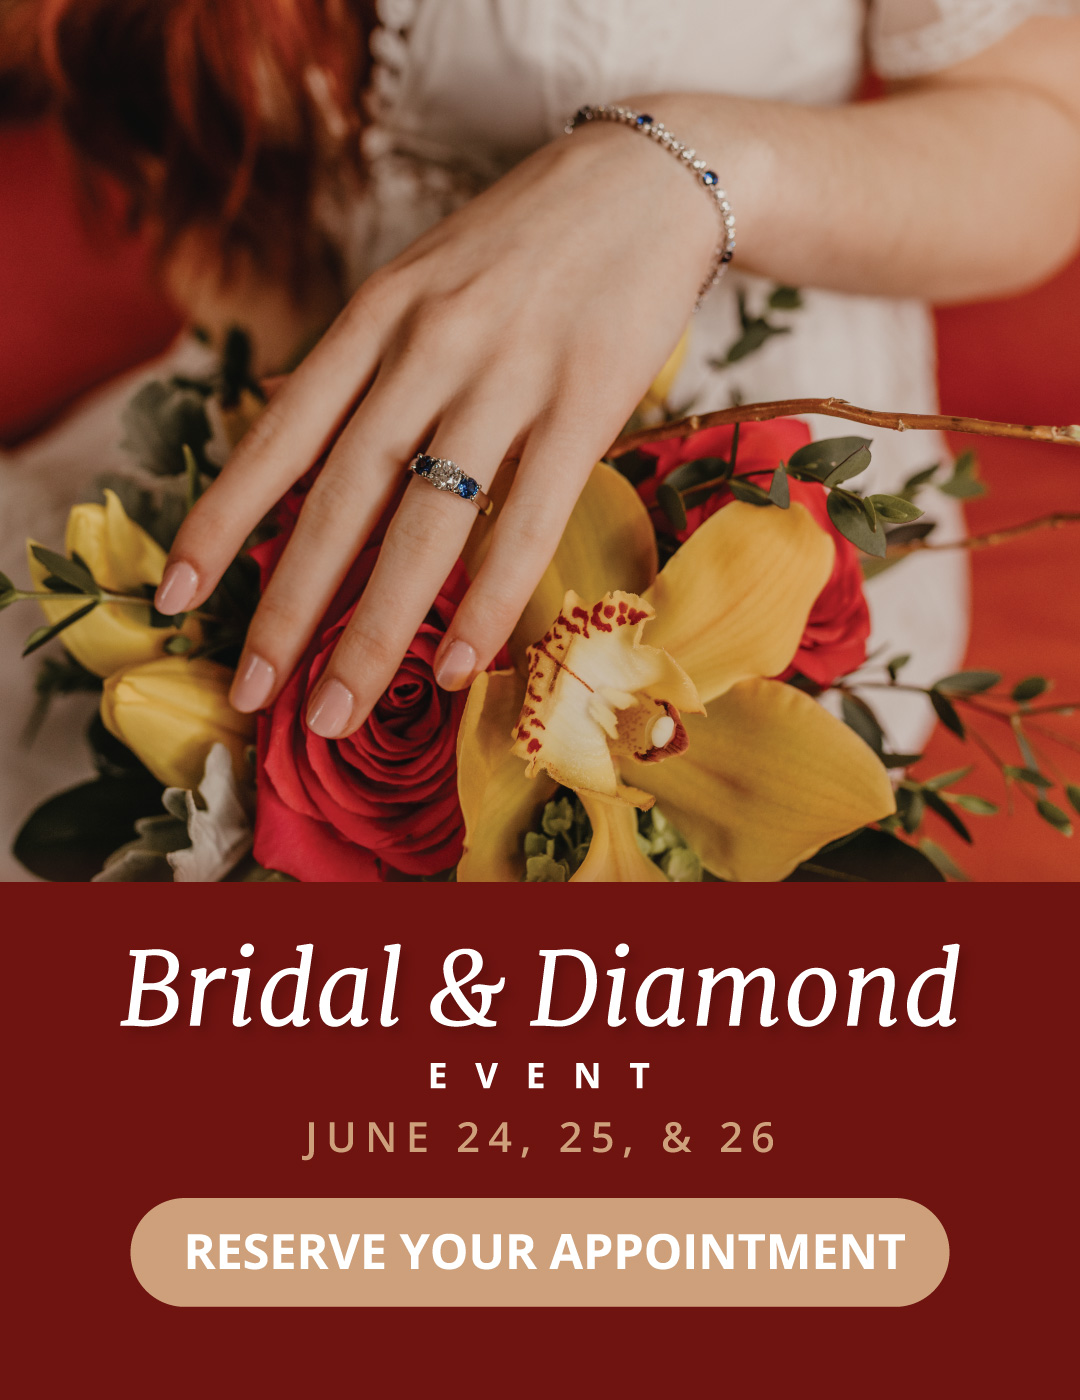 Bridal_Event_2021_Mobile